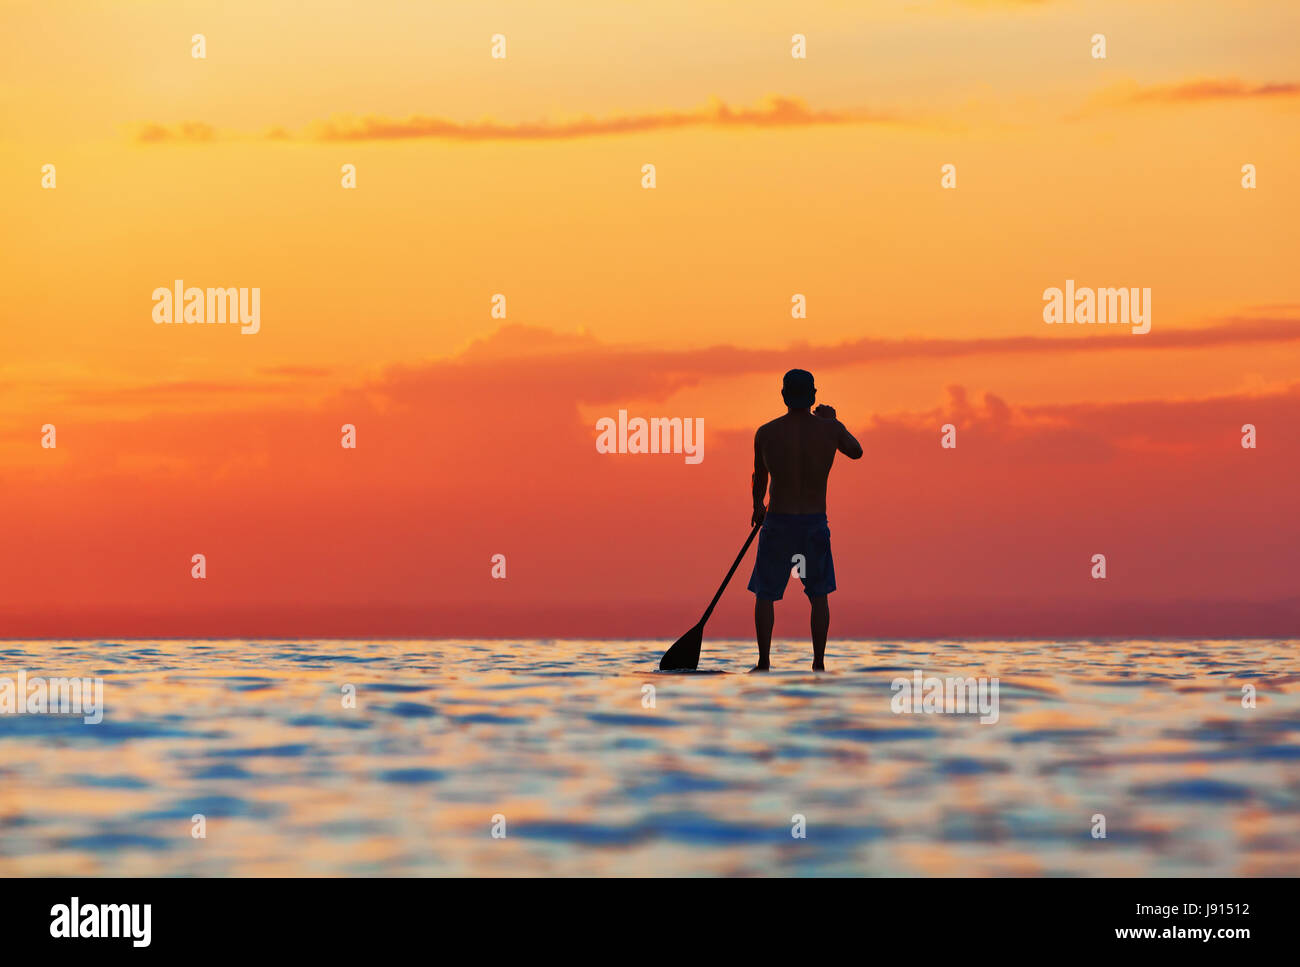 Paddle boarder. Sunset silueta negra del joven deportista remando en stand up paddleboard. Estilo de vida saludable. Imagen De Stock